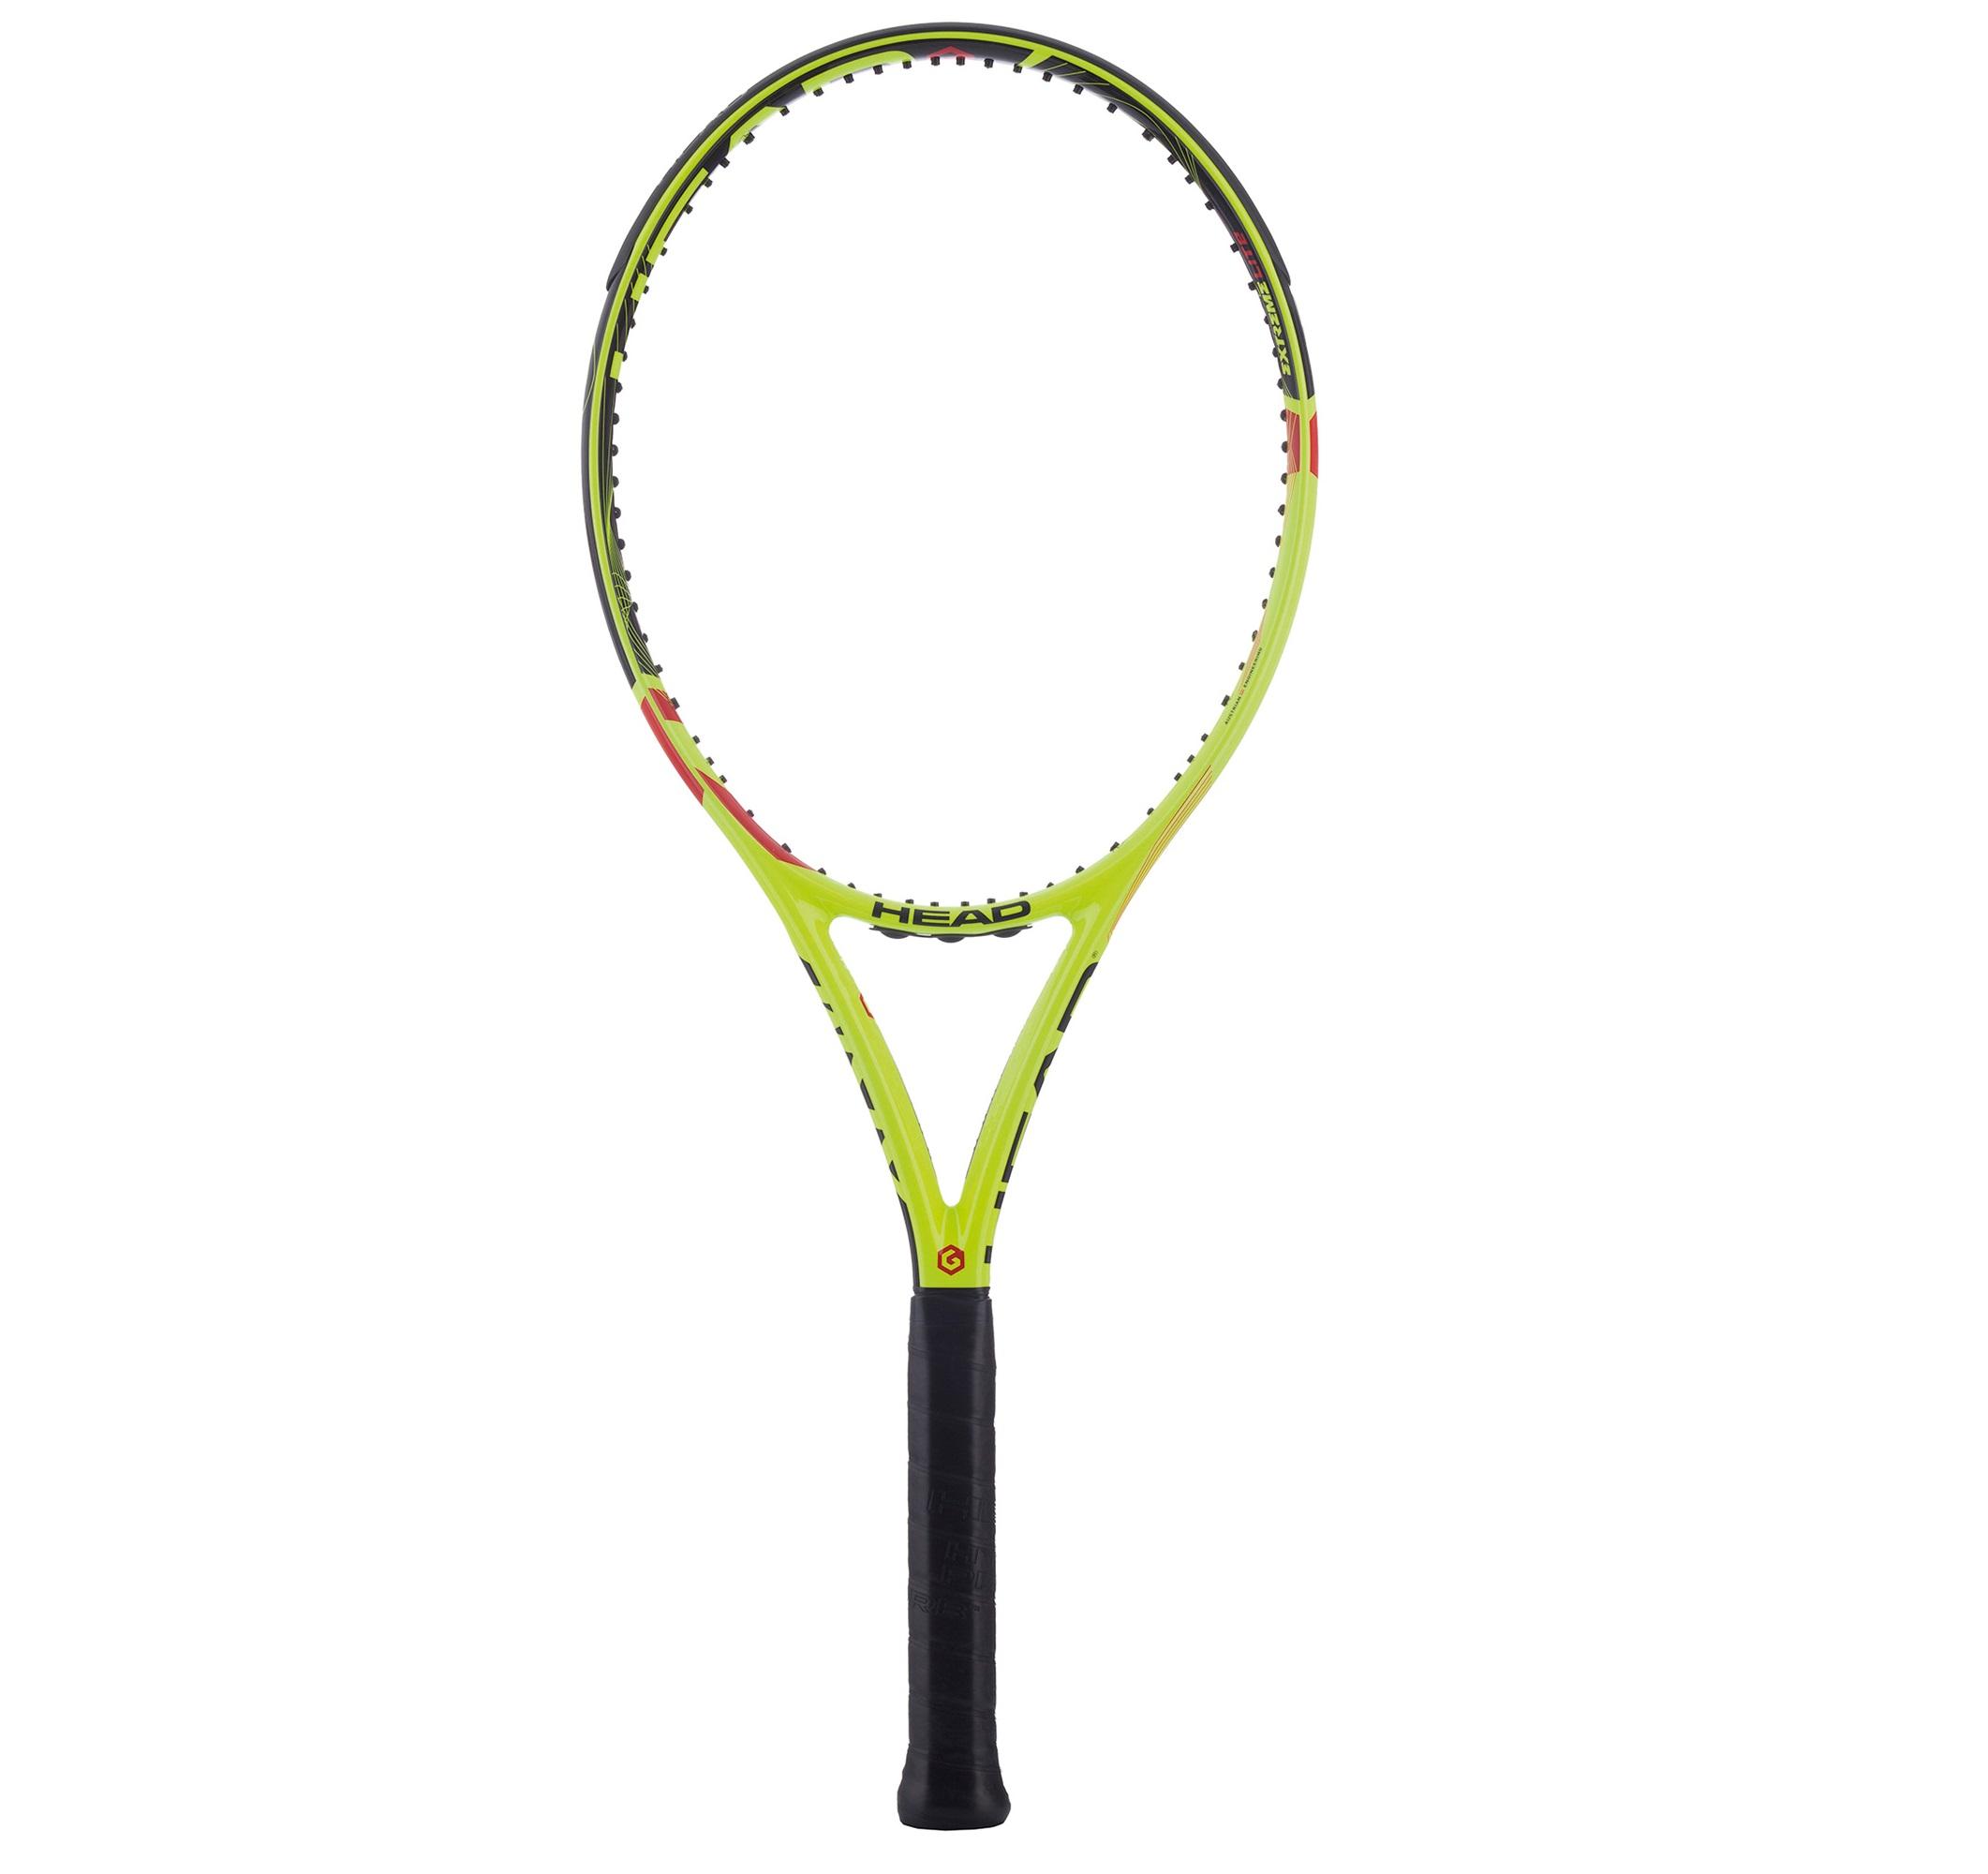 все цены на Head Ракетка для большого тенниса Head Graphene XT Extreme Lite онлайн